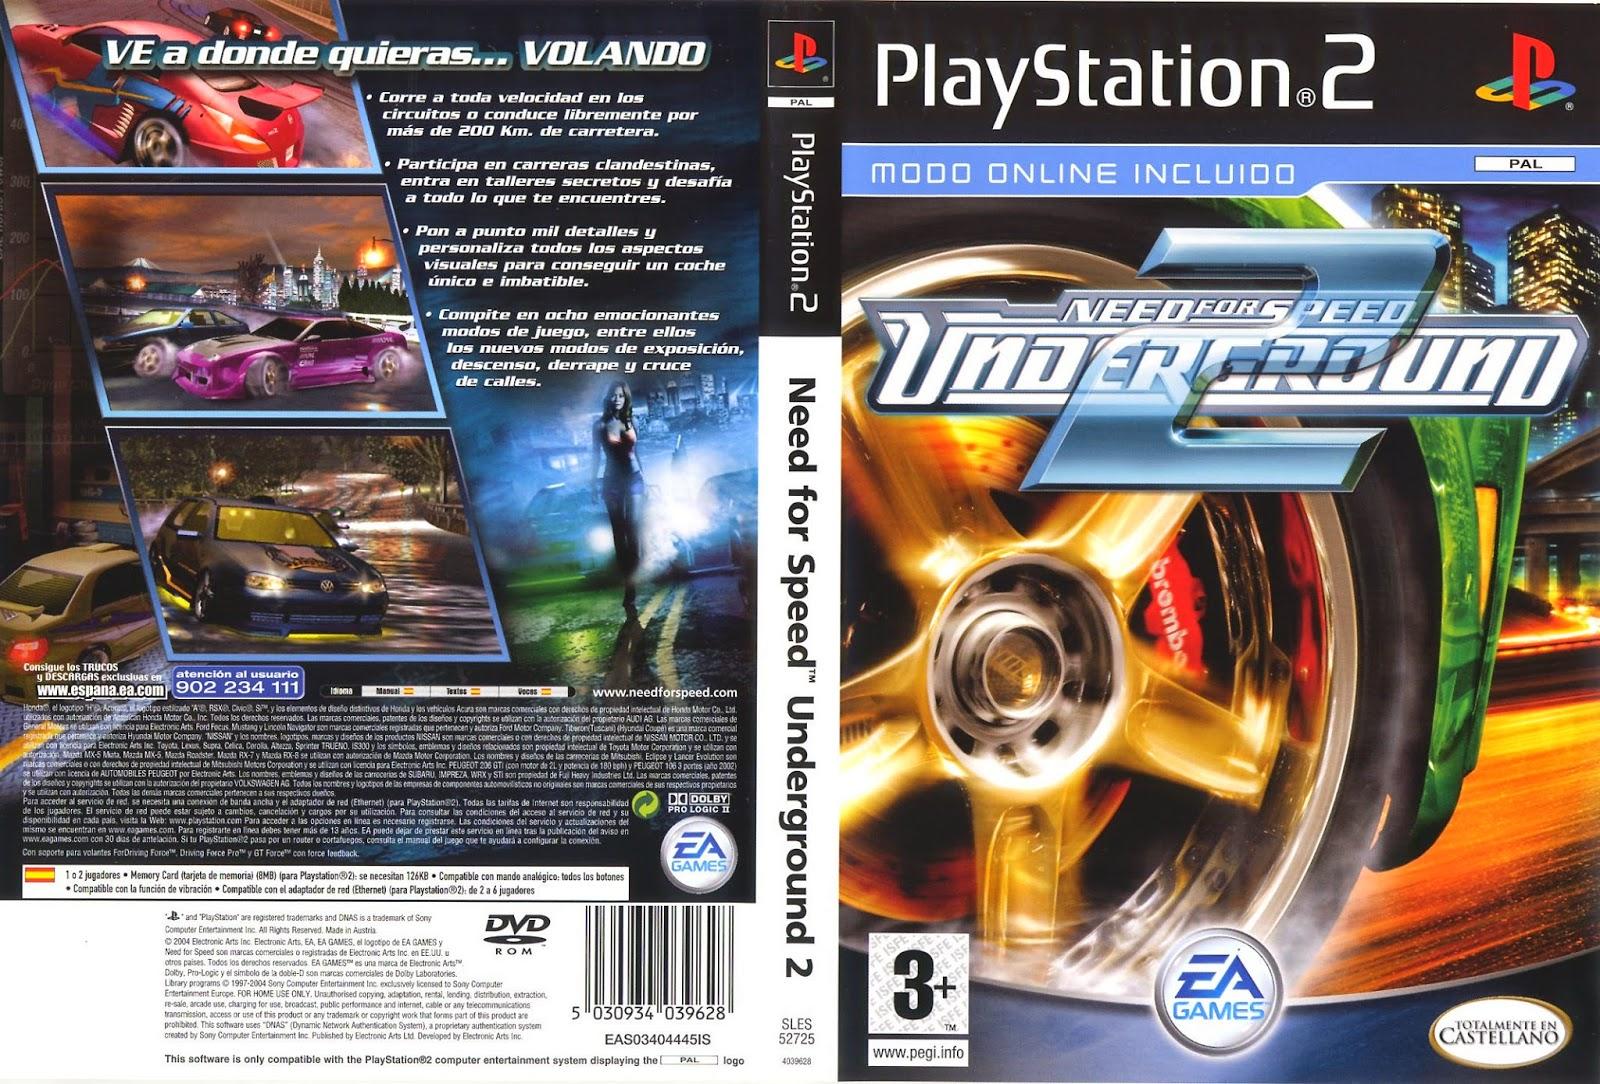 Coleccion Caratulas Ps2 Need For Speed Underground 2